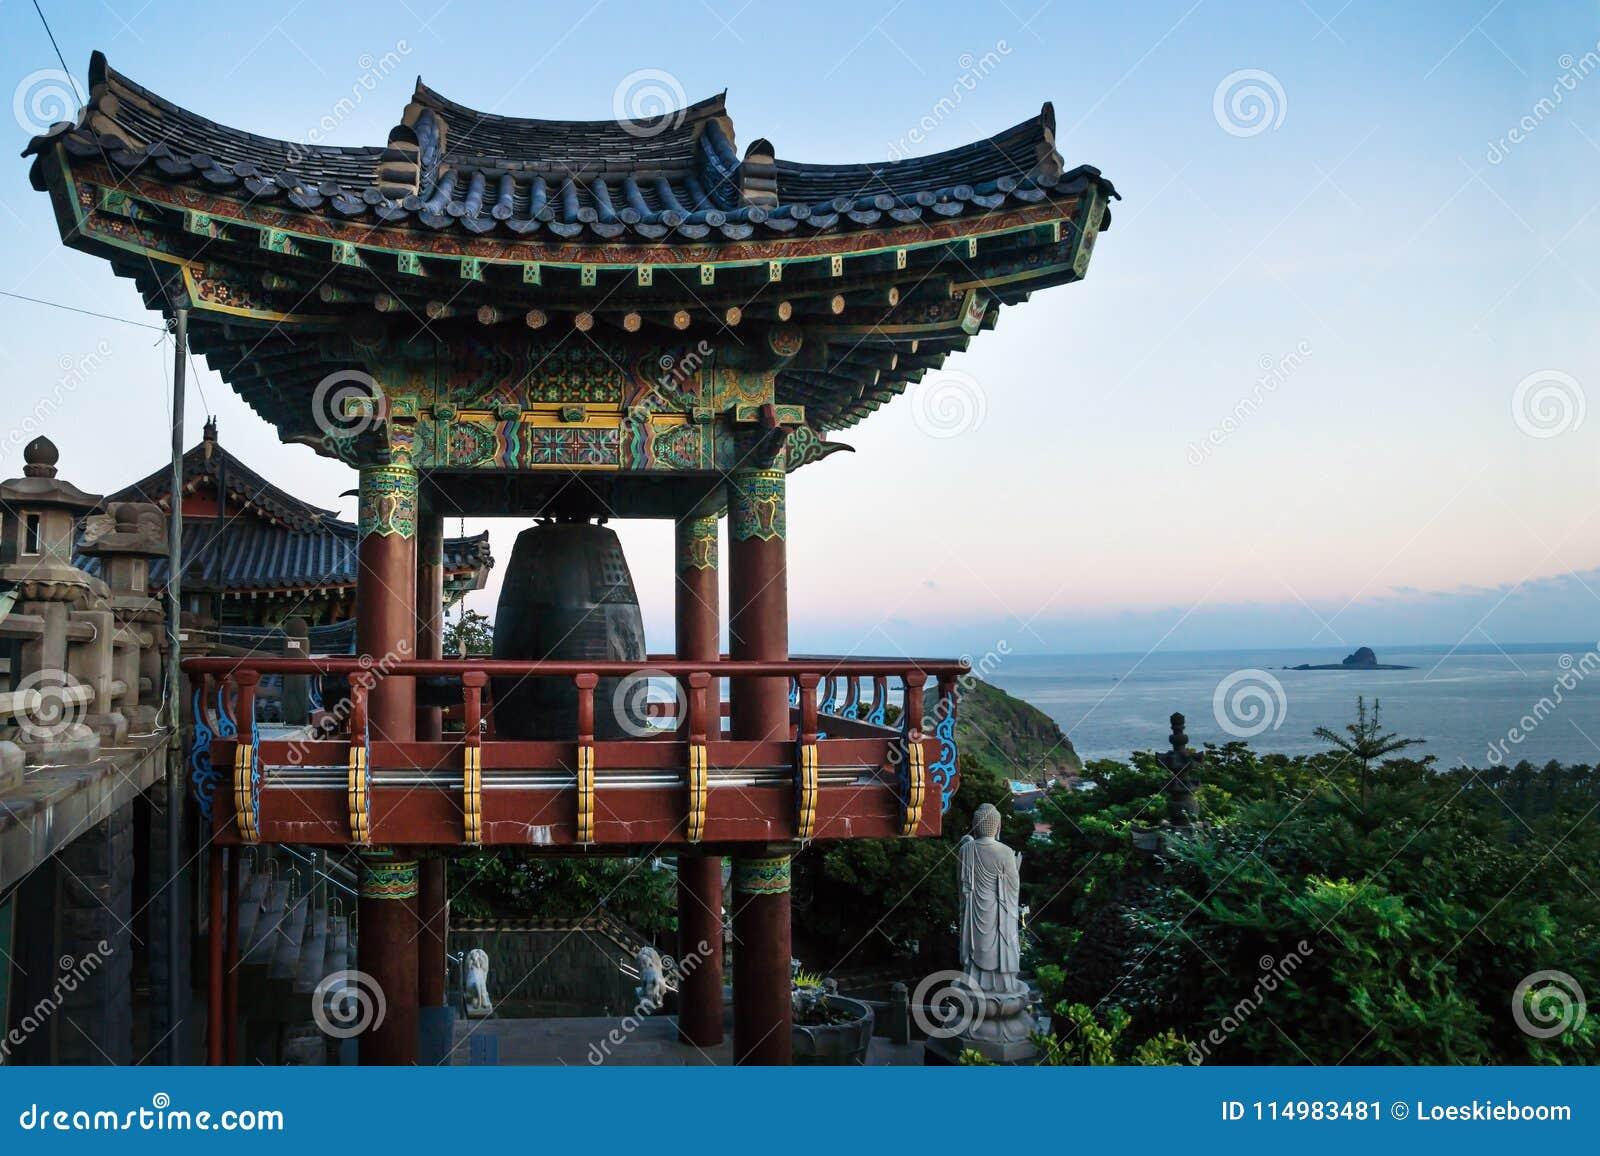 Temple house with bell at Sanbanggulsa temple after sunset, Sanbang-ro, Jeju Island, South Korea